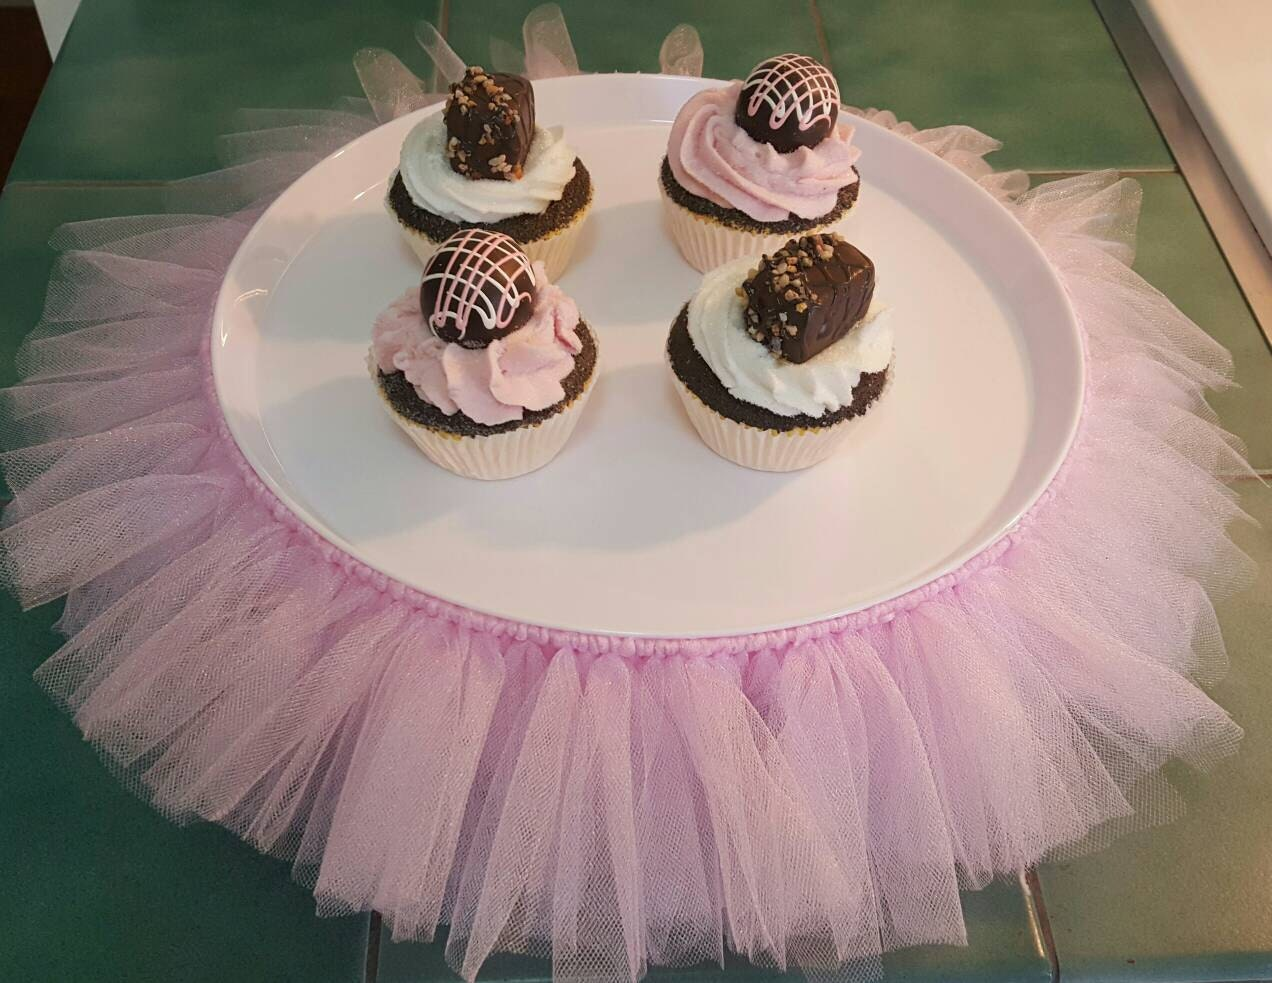 Cake Stand Tutu Pink Xl Cupcake Tier Tulle Skirt Princess